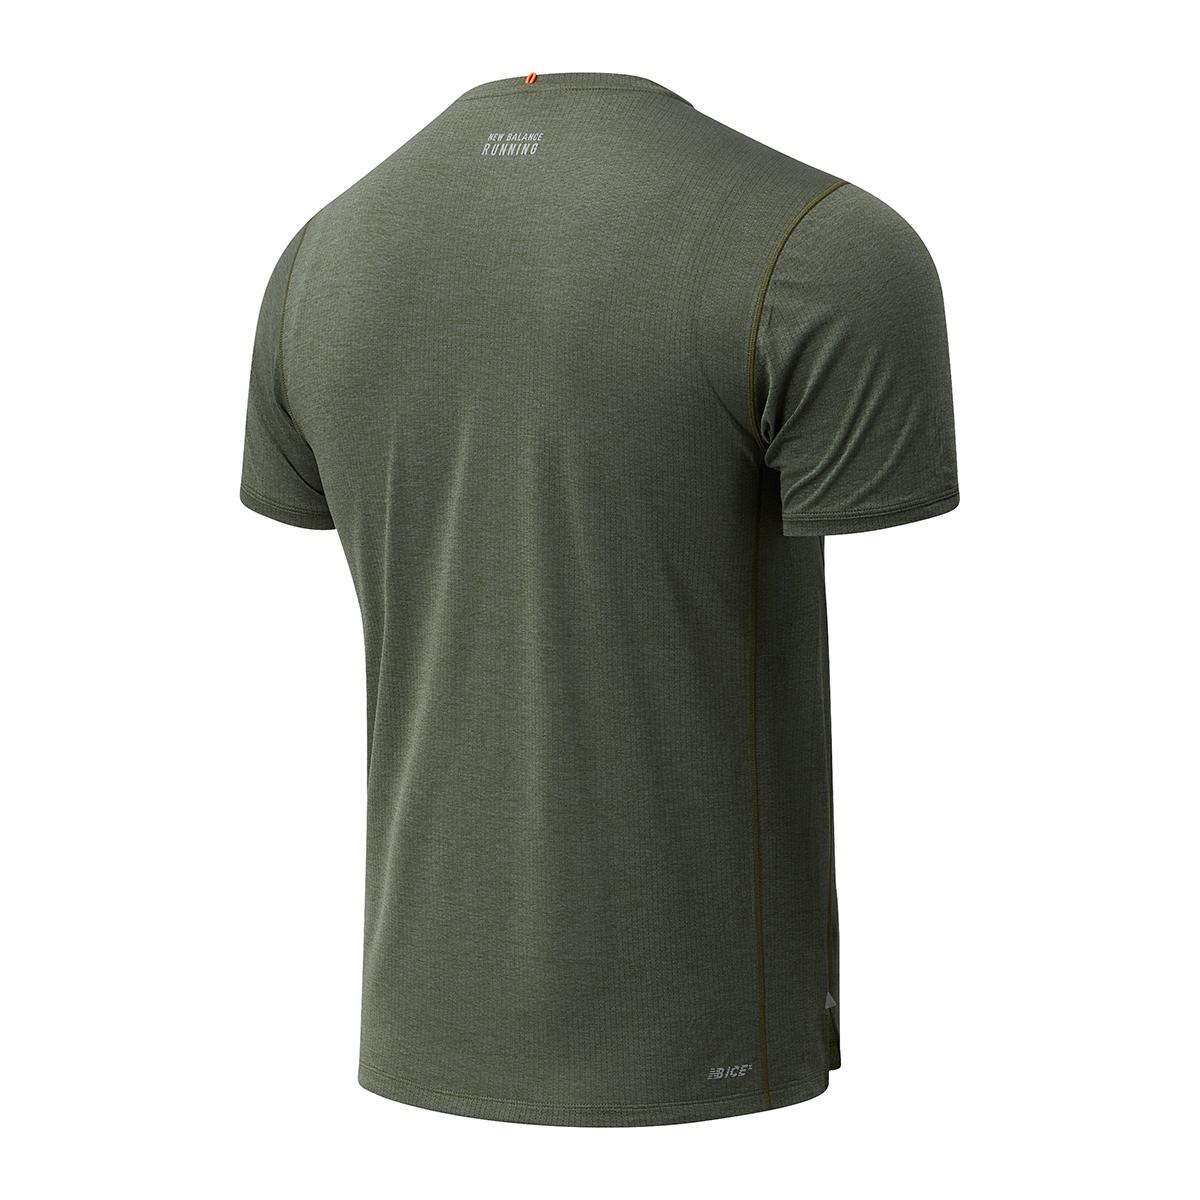 Men's New Balance Impact Run Short Sleeve, , large, image 2